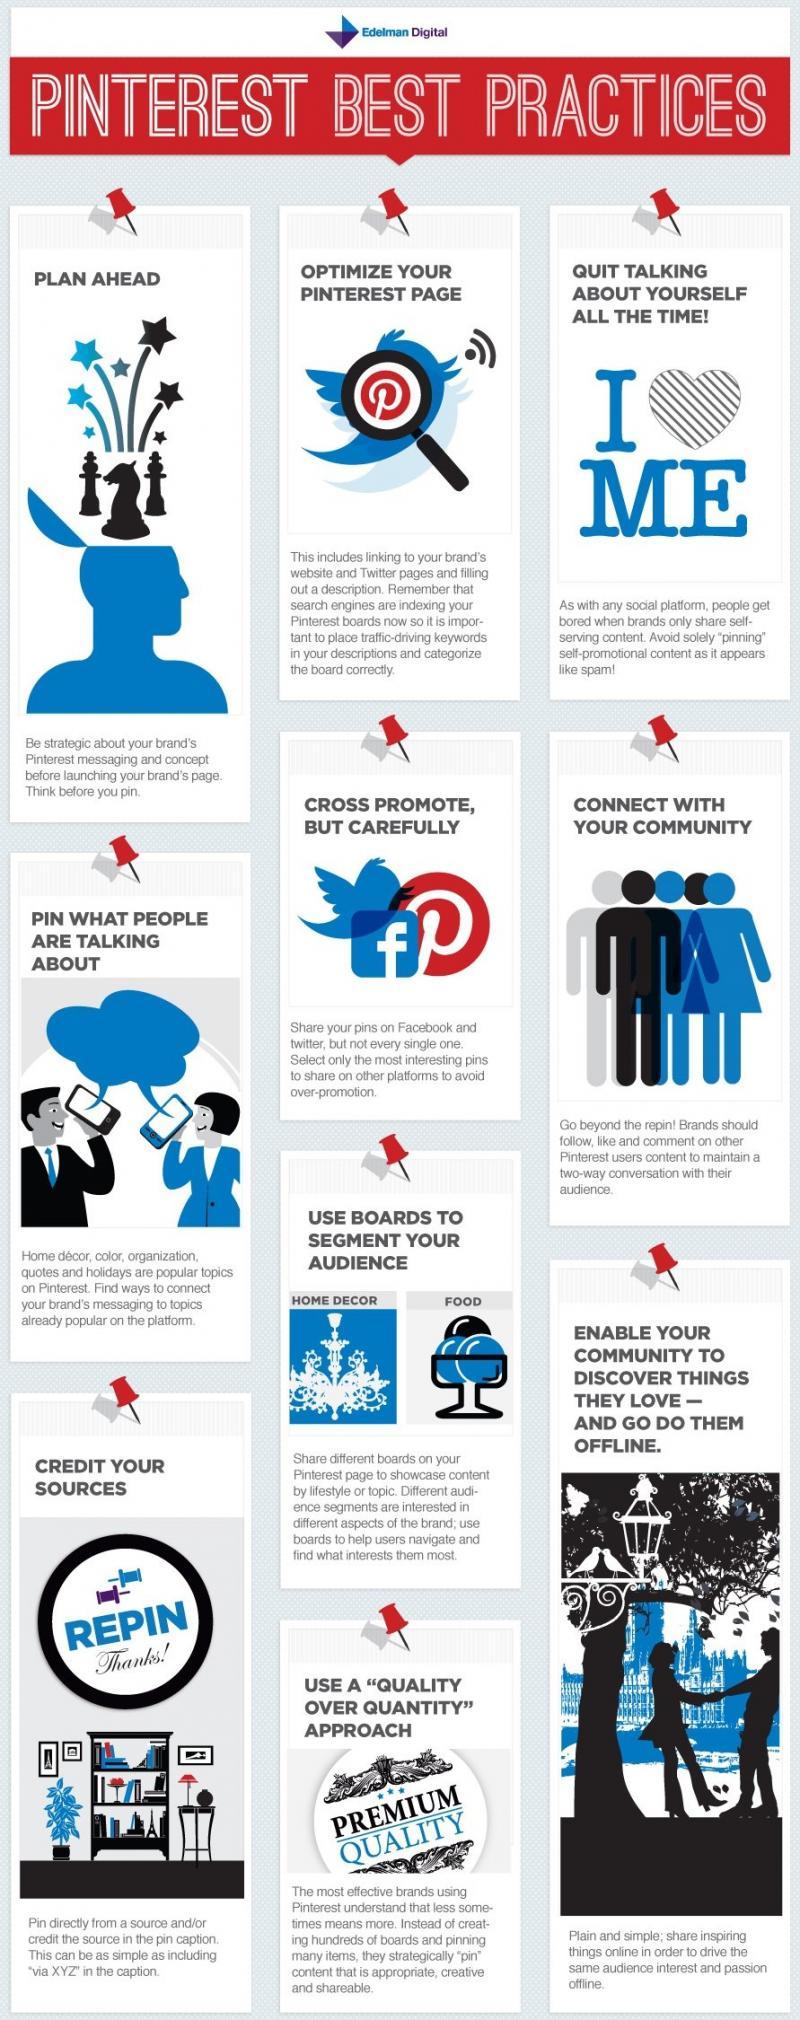 Pinterest best practices #infographic